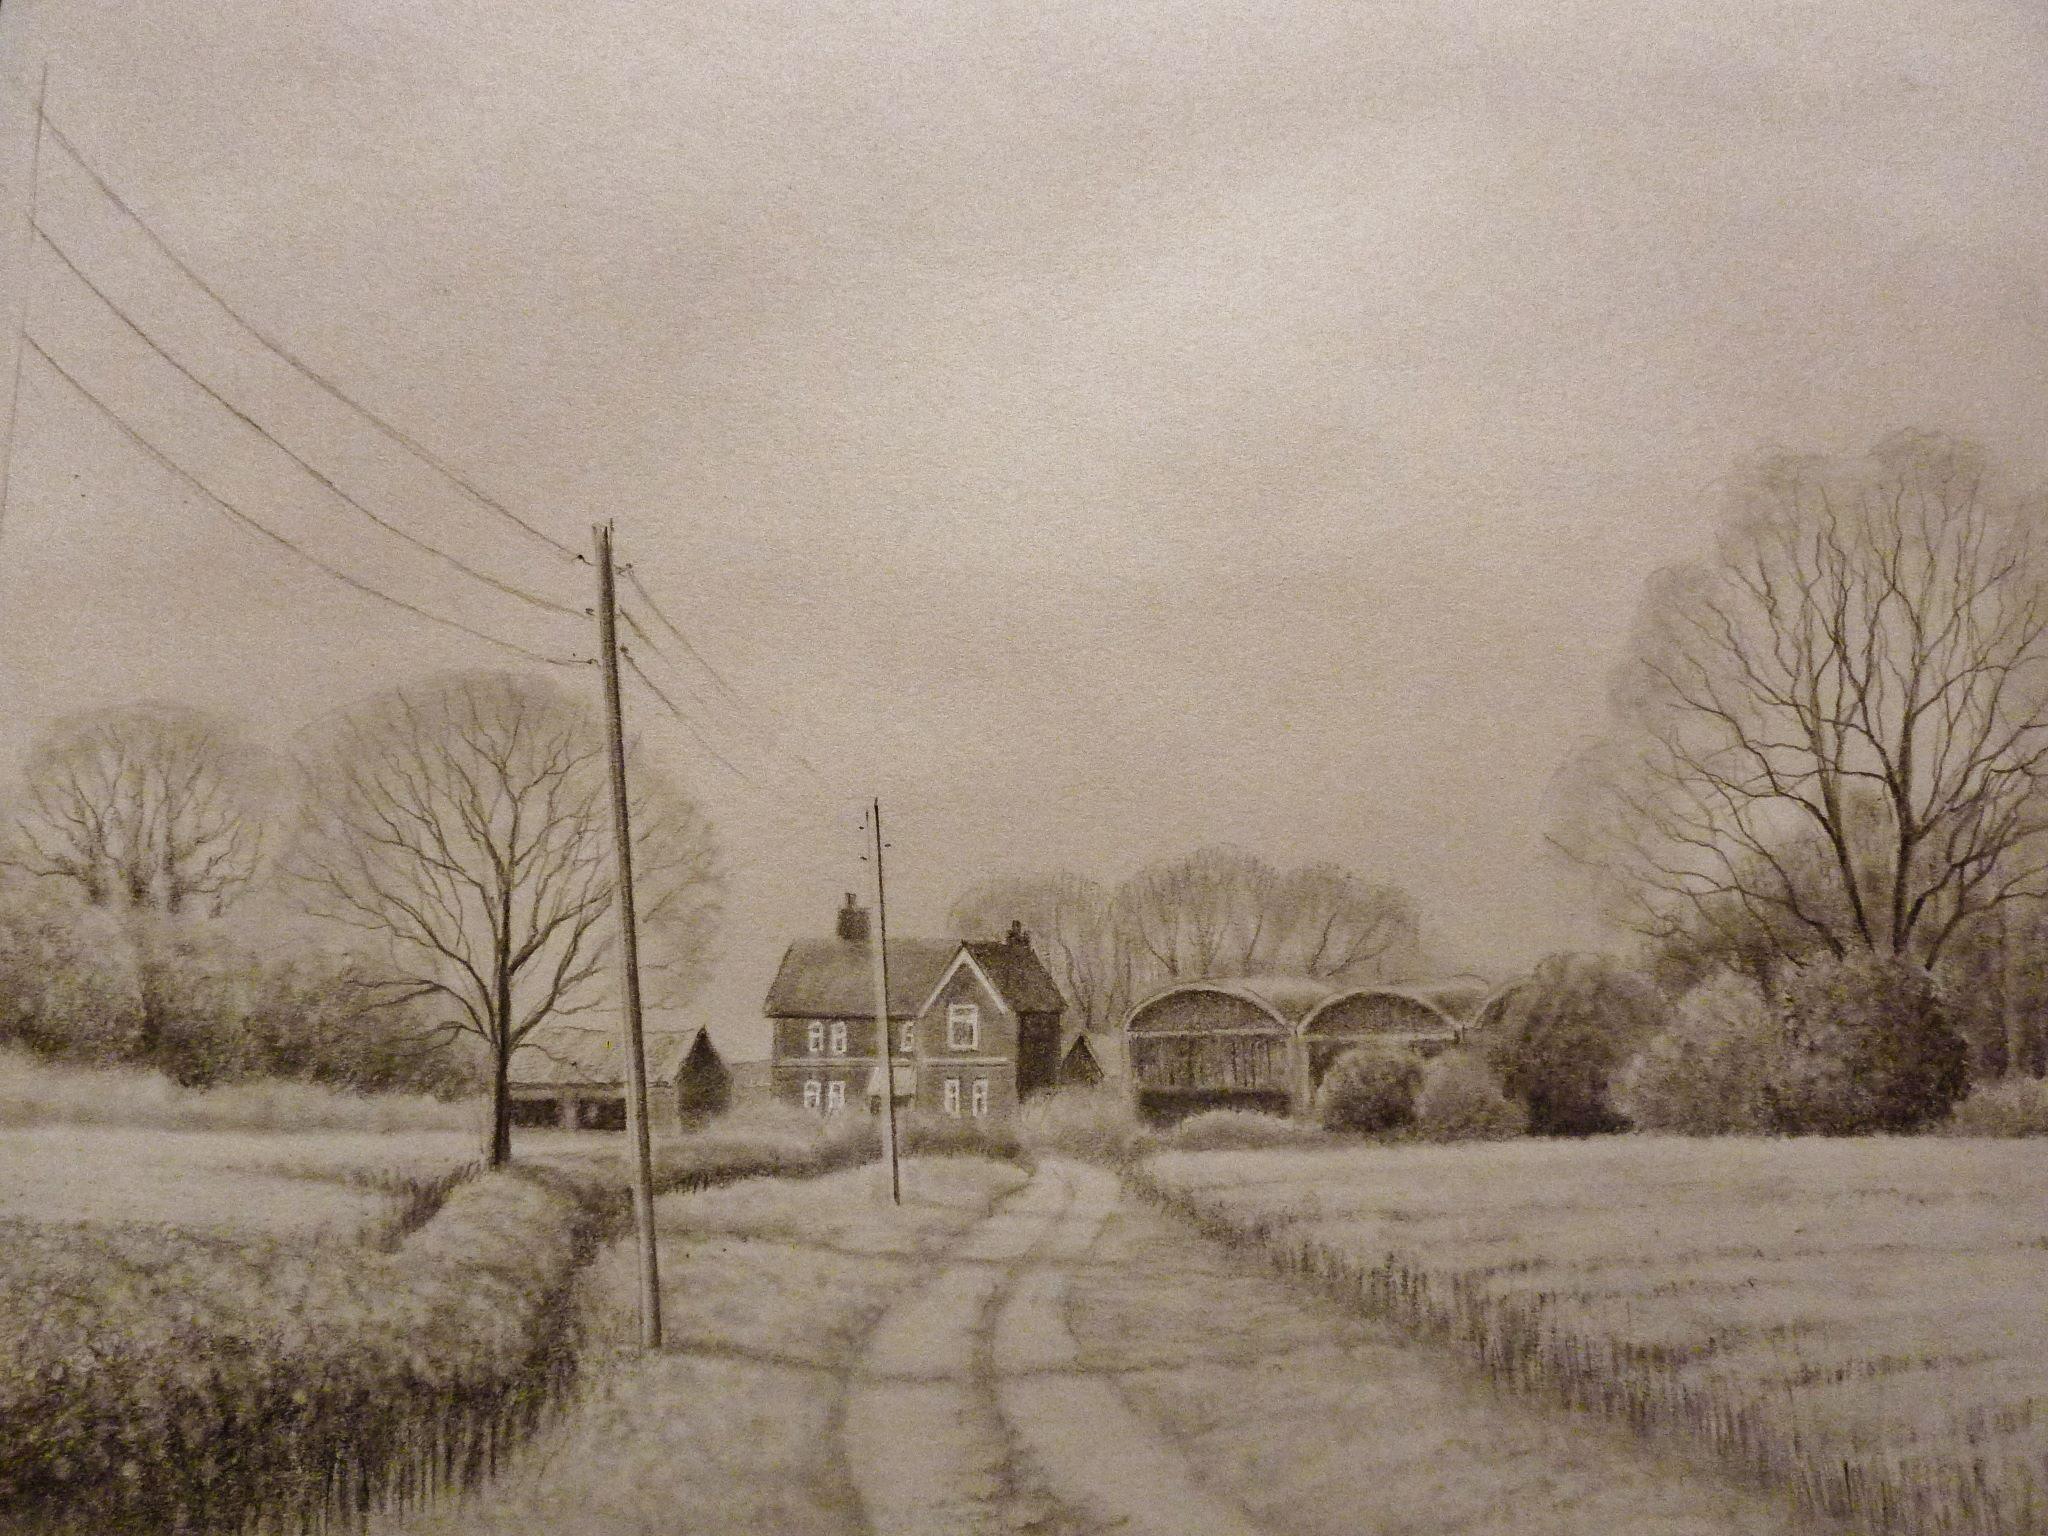 Drawn road pencil drawing  drawing Time YouTube farm